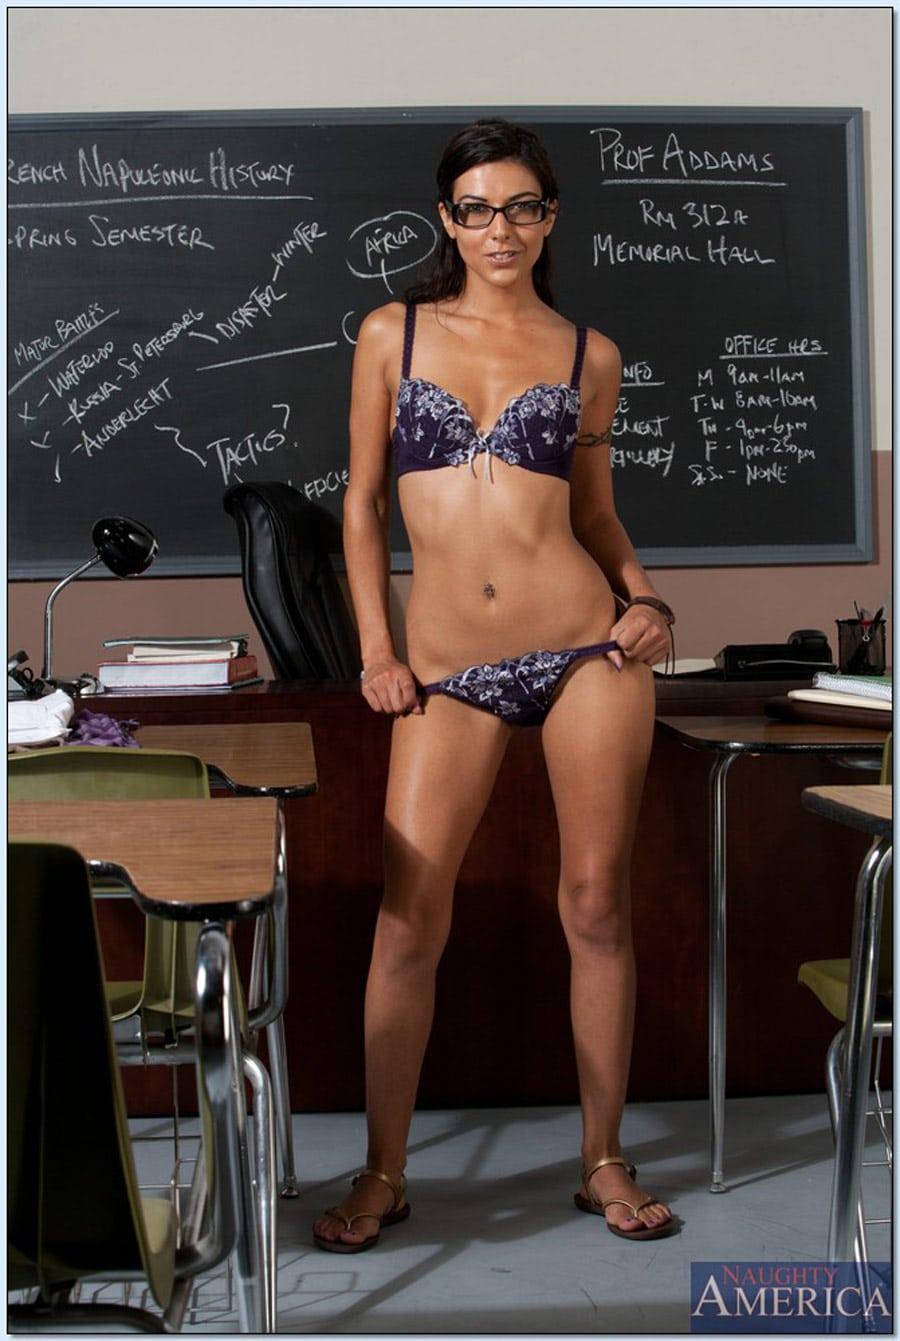 lou-charmelle-etudiante-sexy-nue-naughtyamerica-6